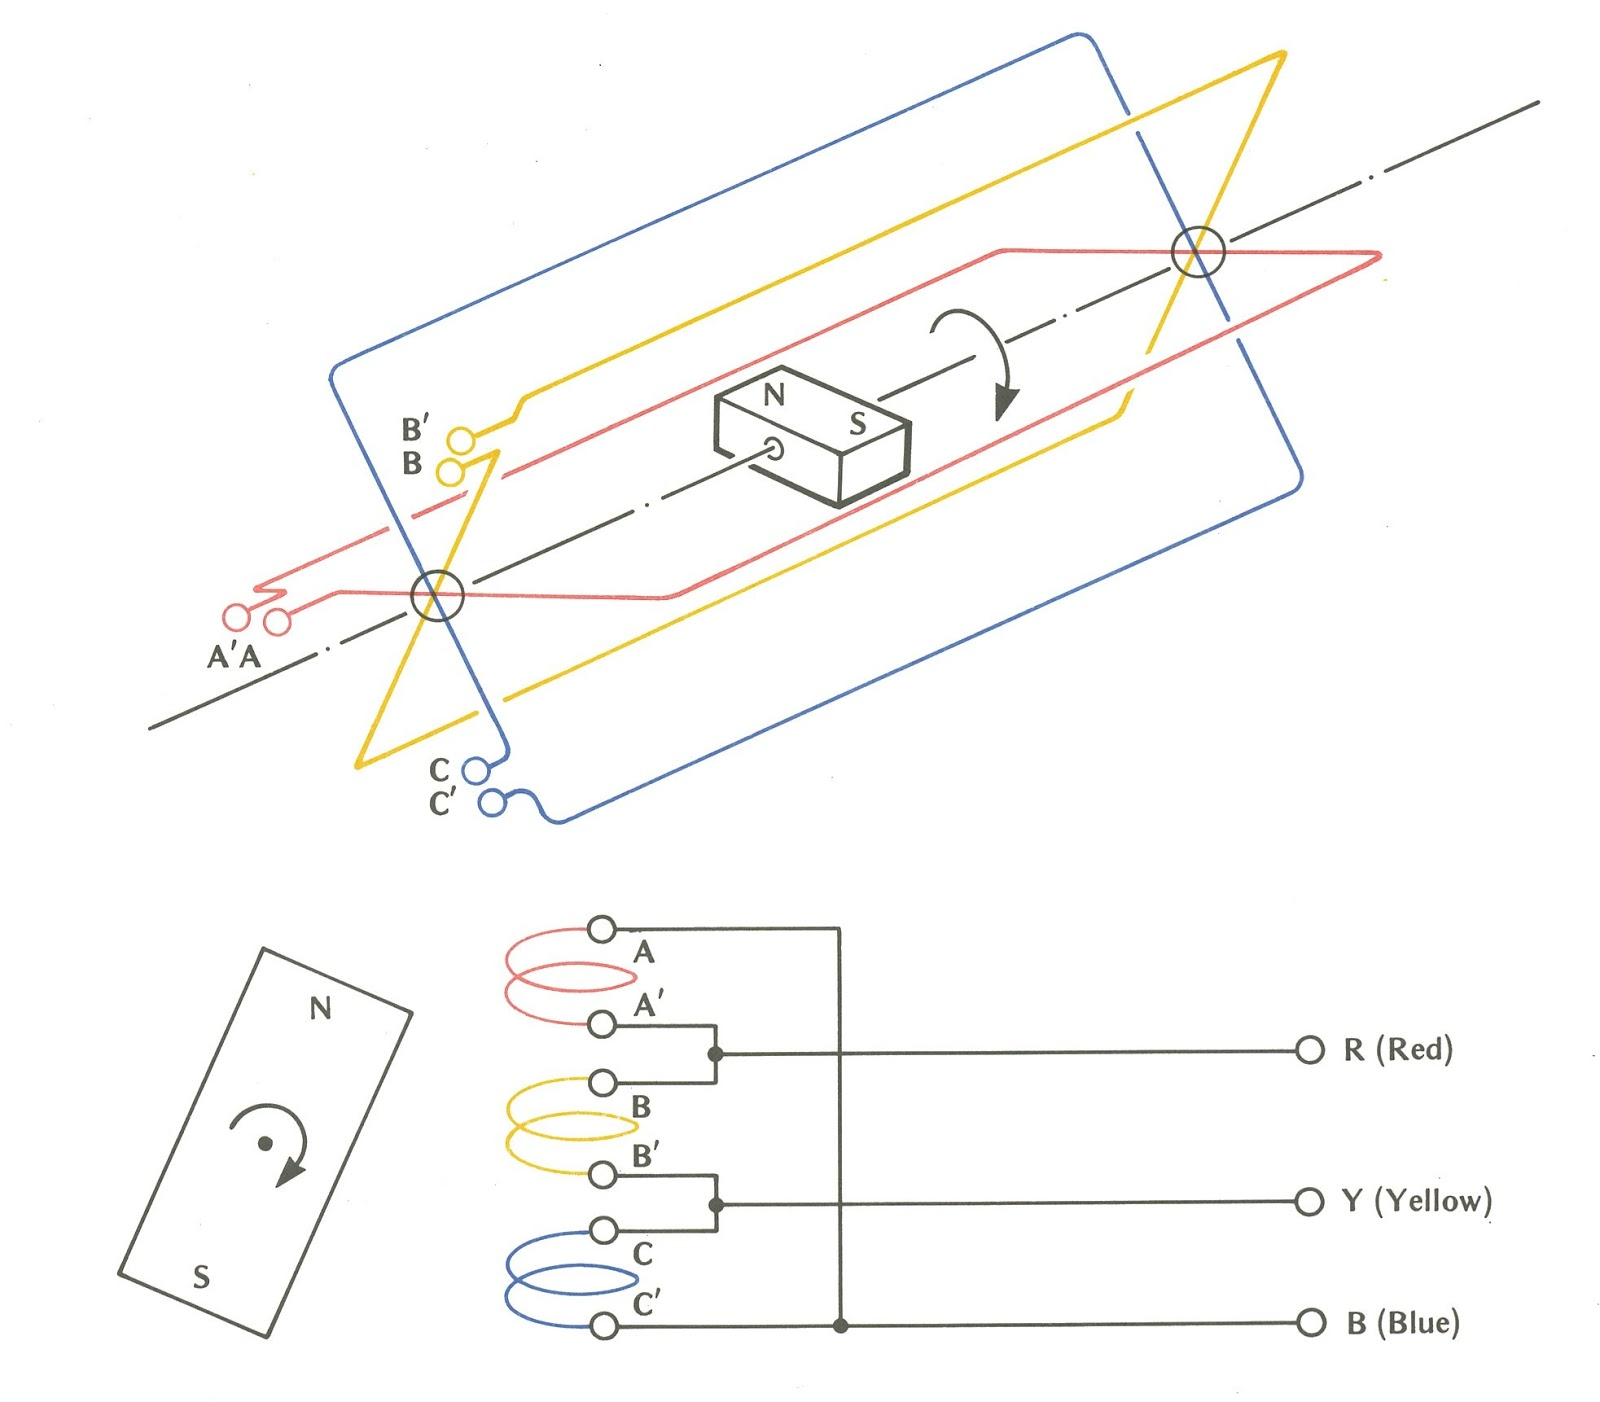 phase ac generator wiring diagram images volt wiring to alternator conversion wiring diagram 1 3 phase [ 1600 x 1402 Pixel ]